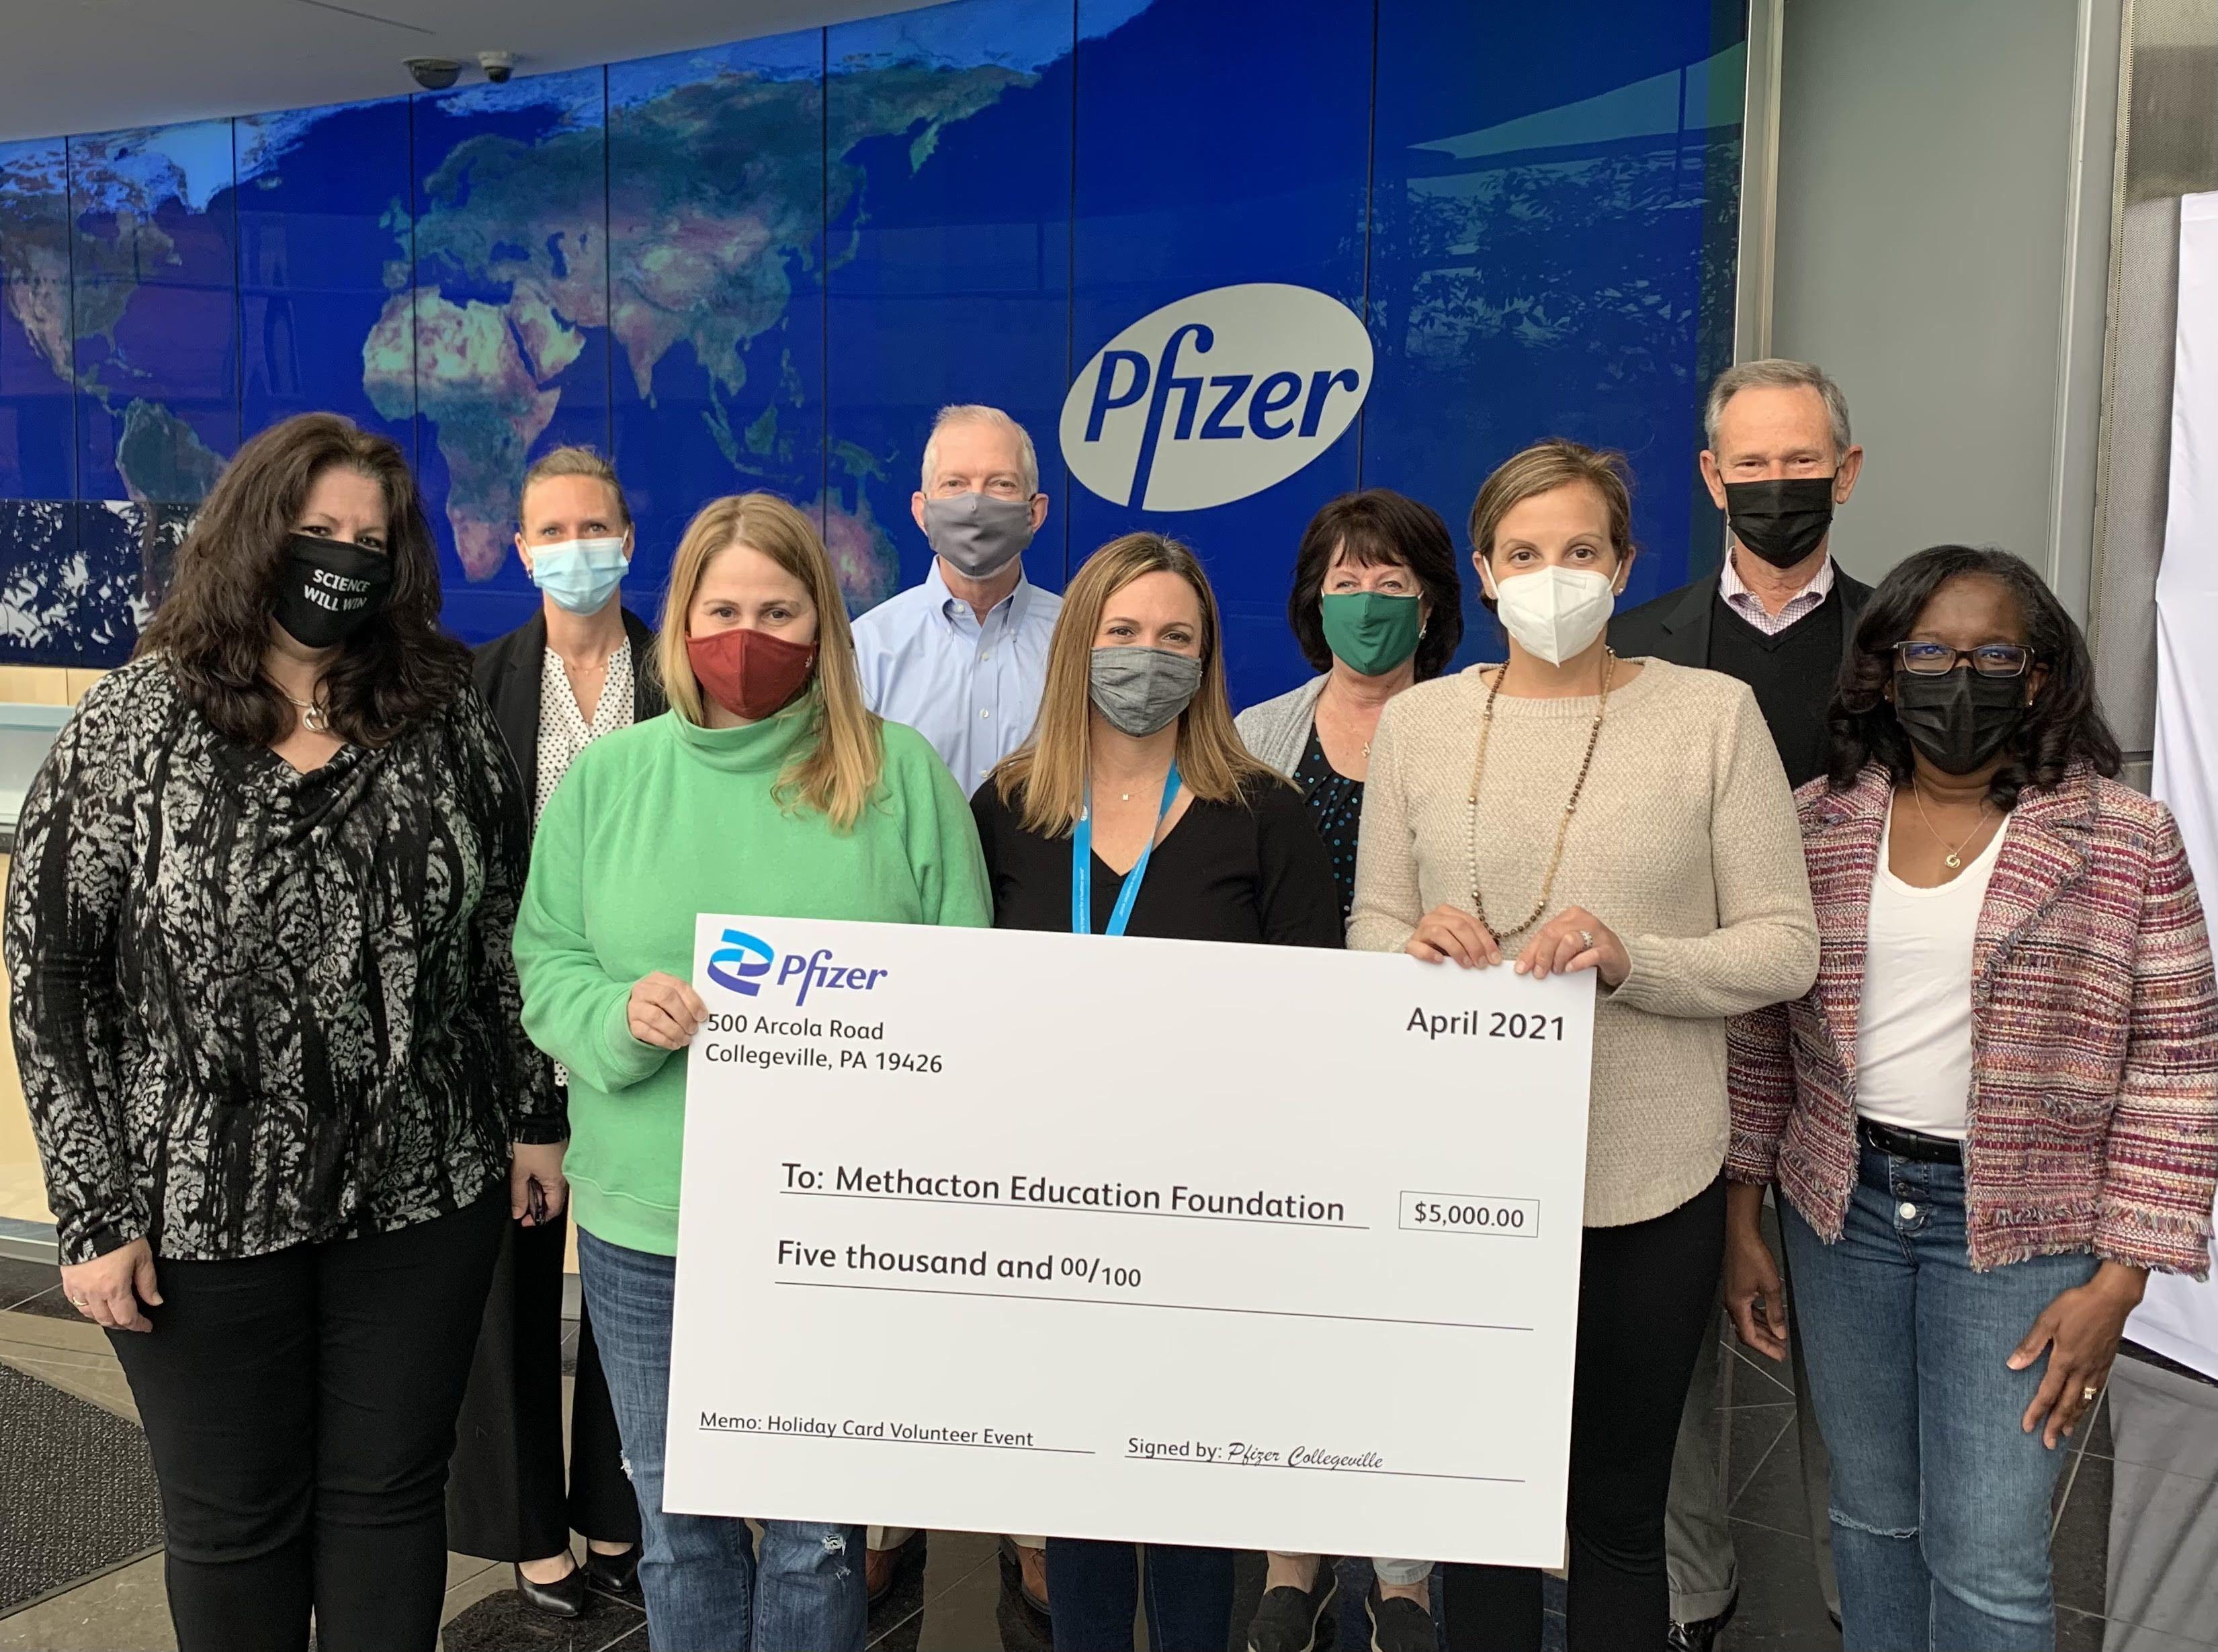 Pfizer Donates $5,000 to Support Methacton Education